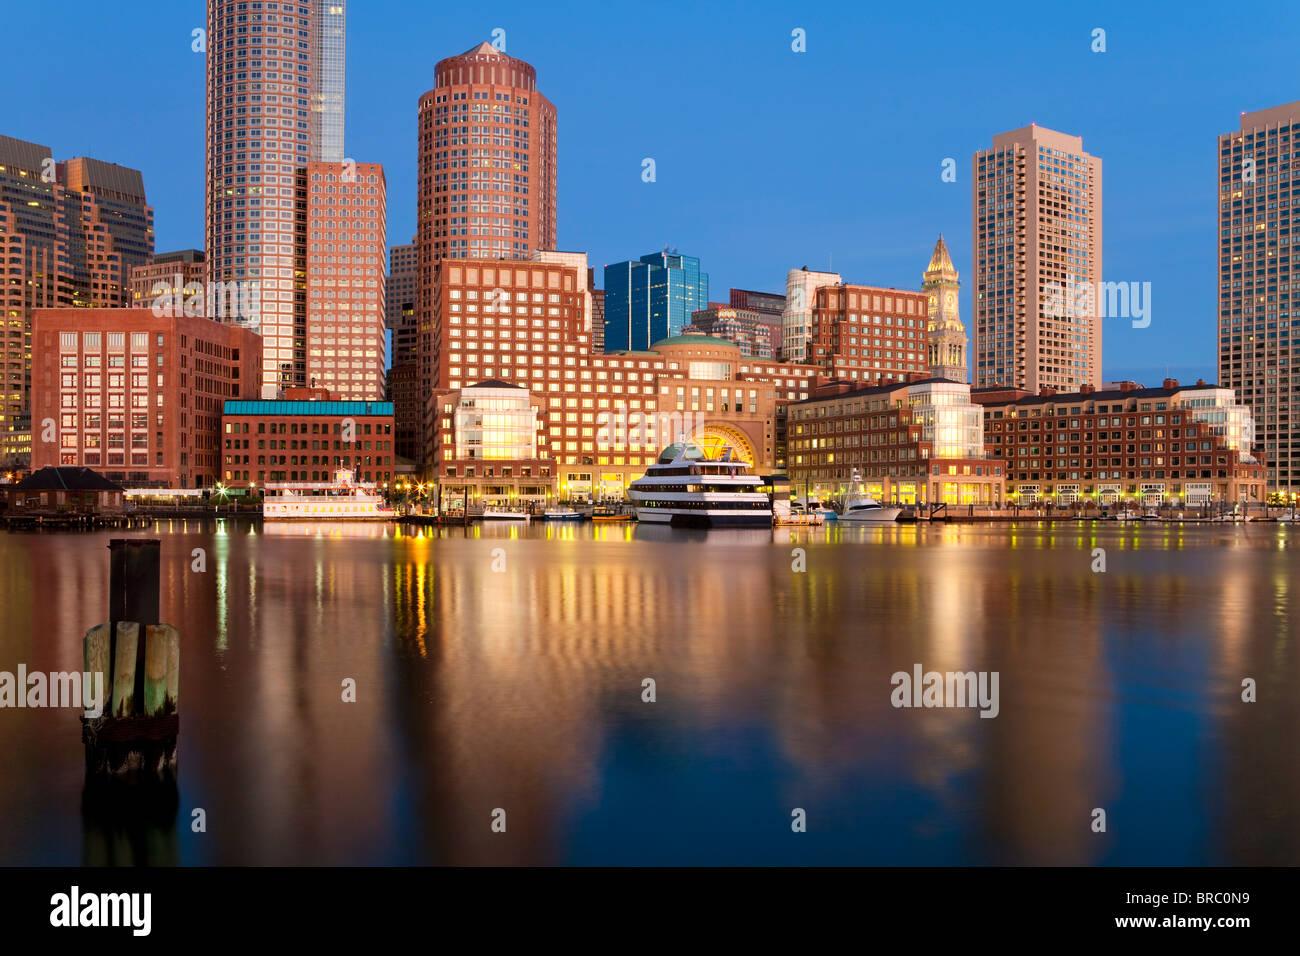 Skyline e porto interno compresi Rowes Wharf all'alba, Boston, Massachusetts, New England, STATI UNITI D'AMERICA Immagini Stock